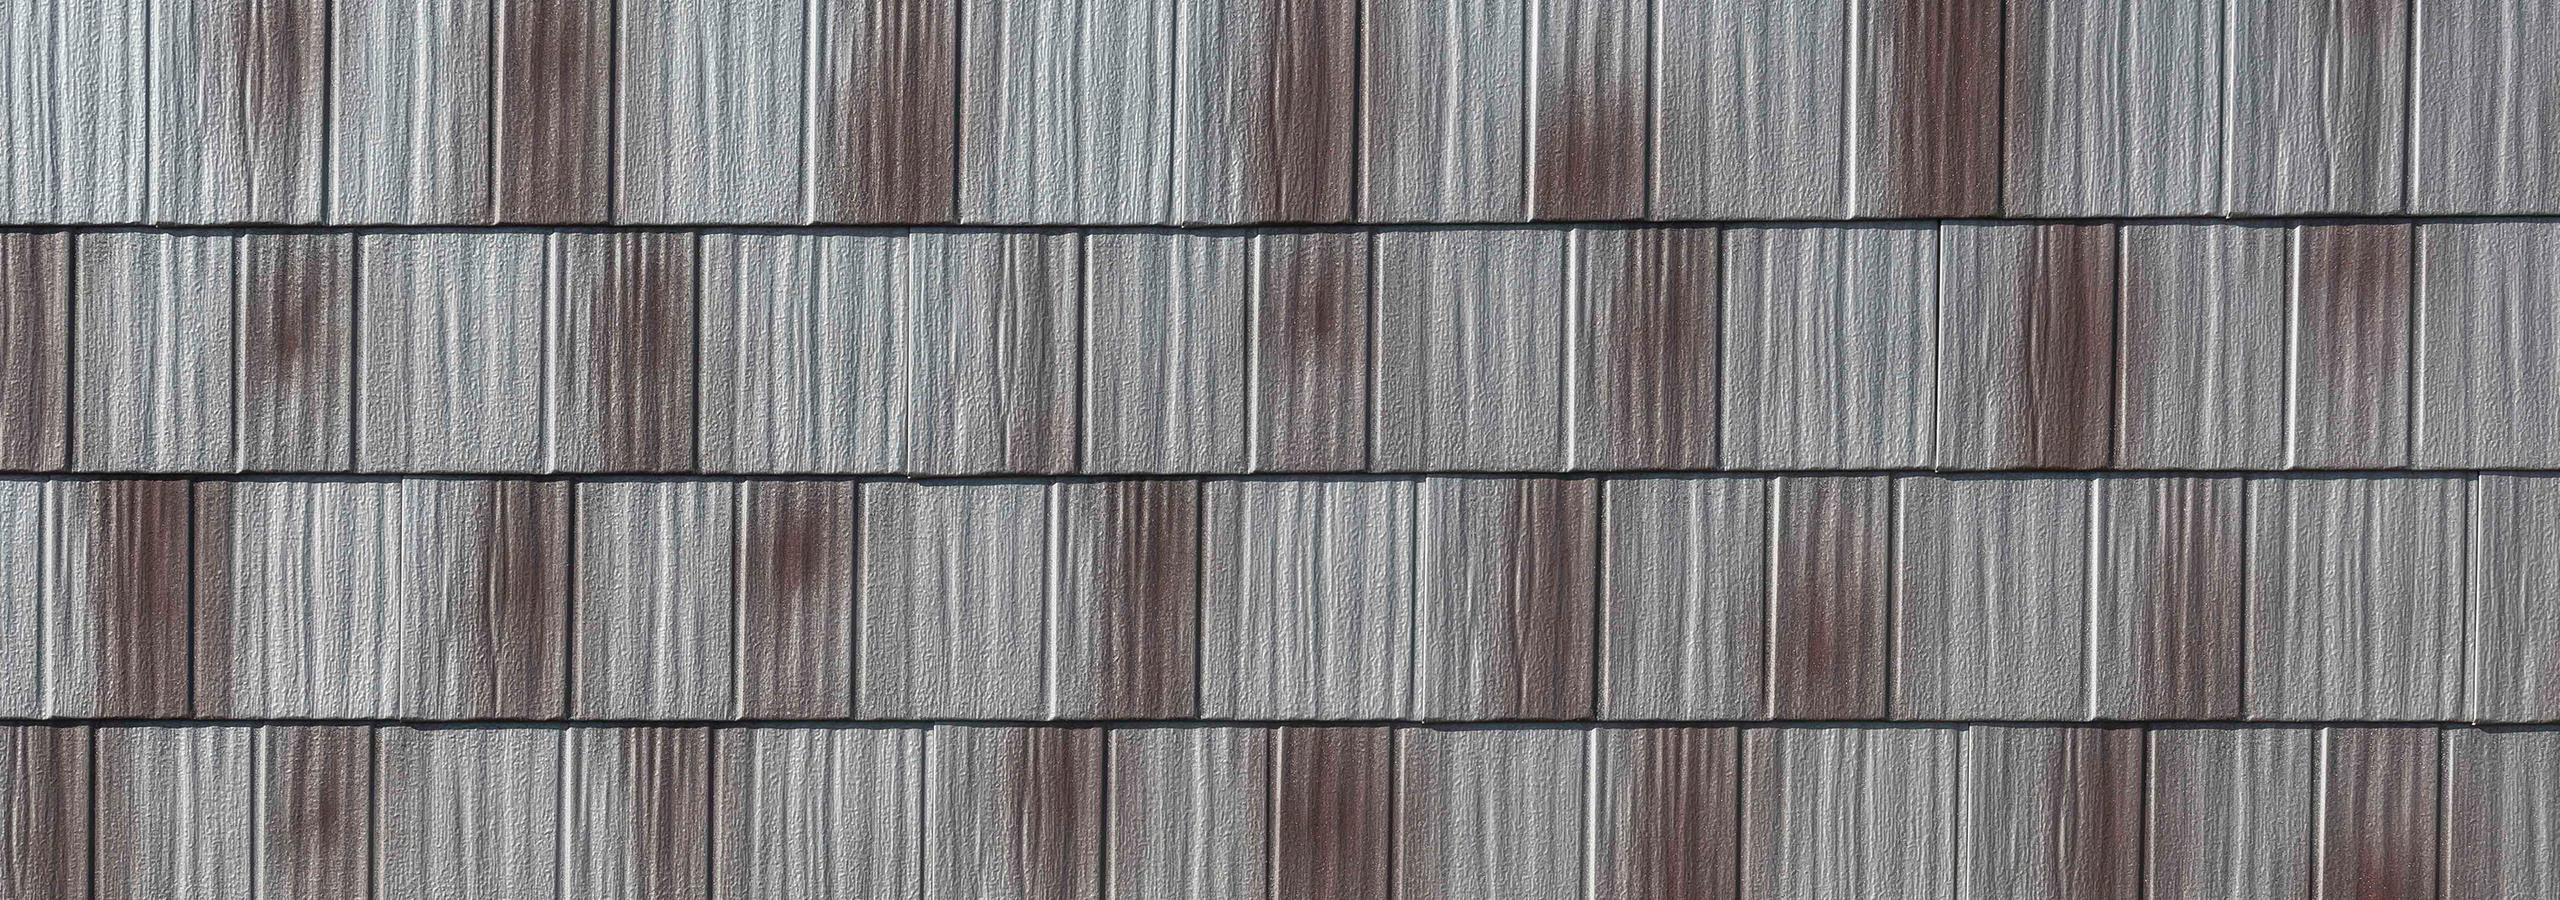 Infiniti roadhouse stone coated shake roofing